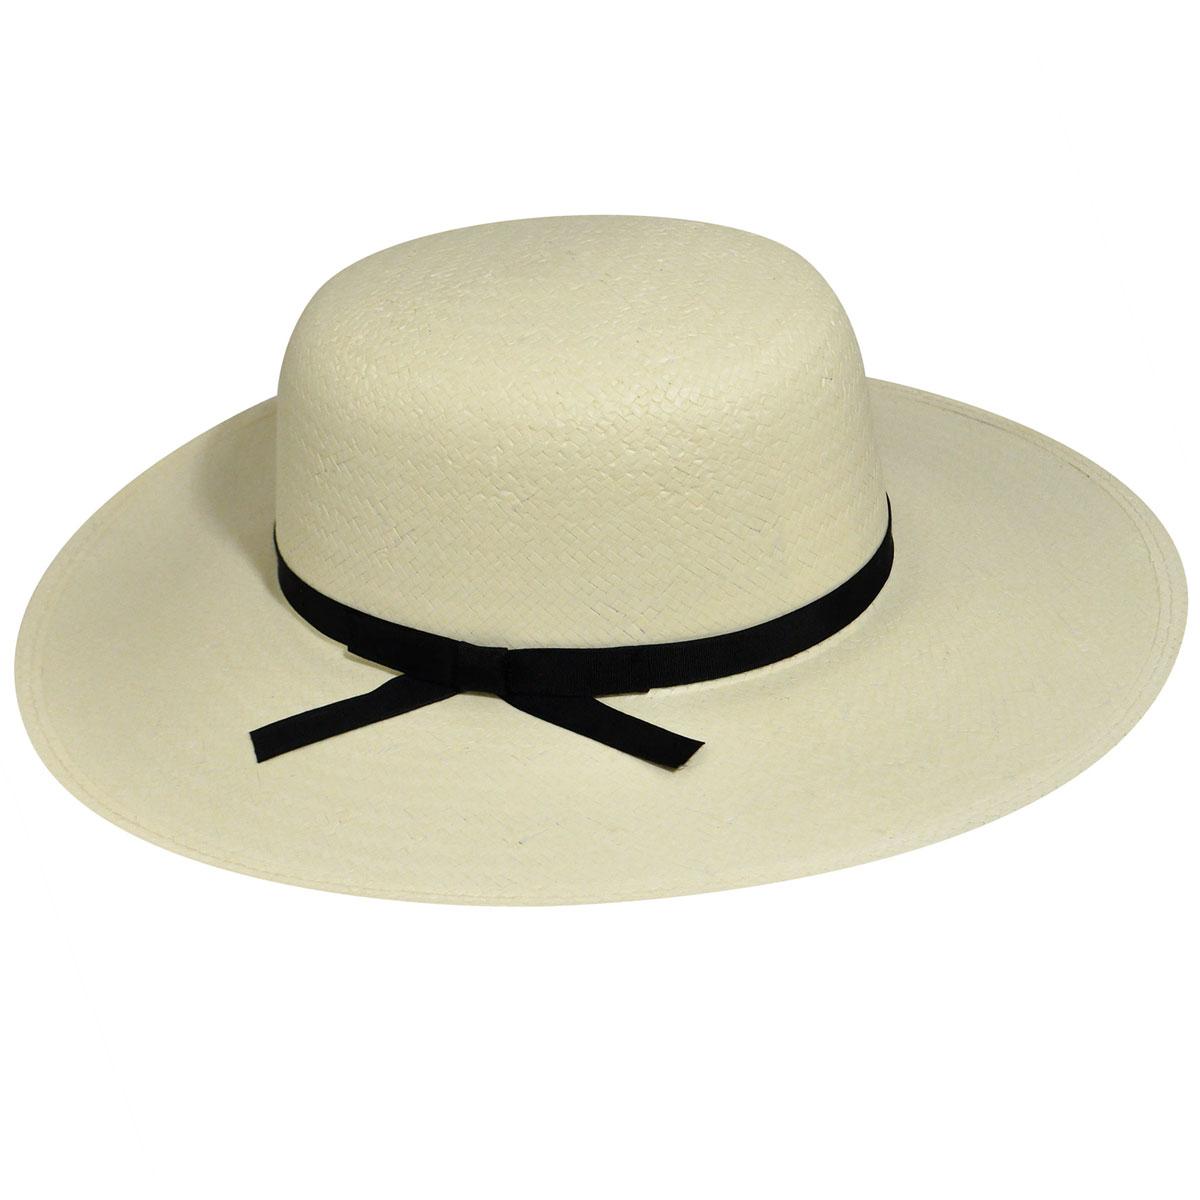 1920s Hat Styles for Women- History Beyond the Cloche Hat LiteStraw reg Stephanie Wide Brim Hat $62.00 AT vintagedancer.com